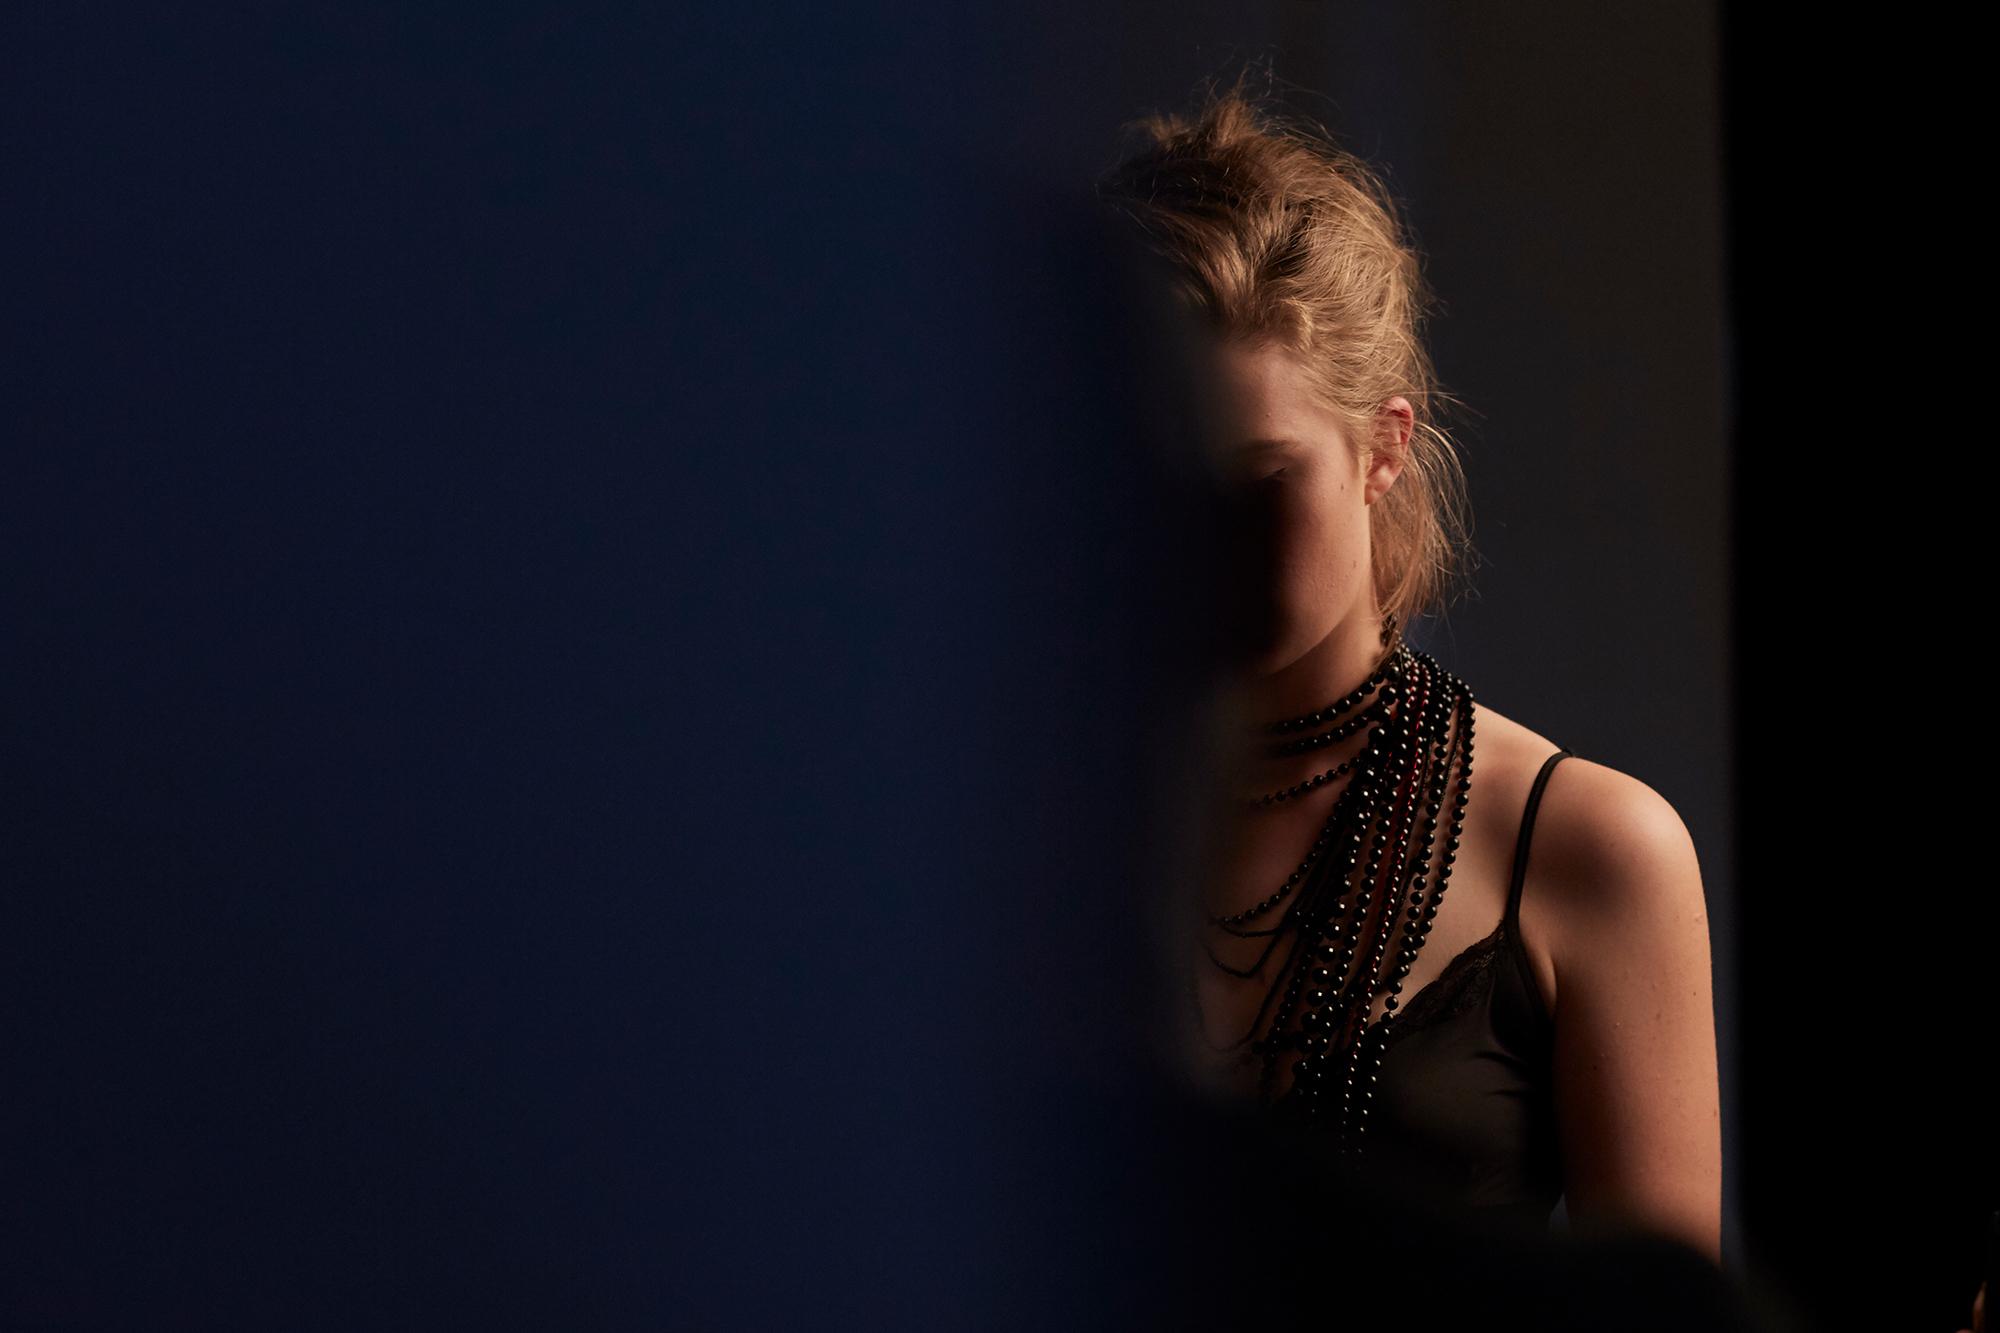 Intrusion 04 / photograph: Clare Plueckhahn